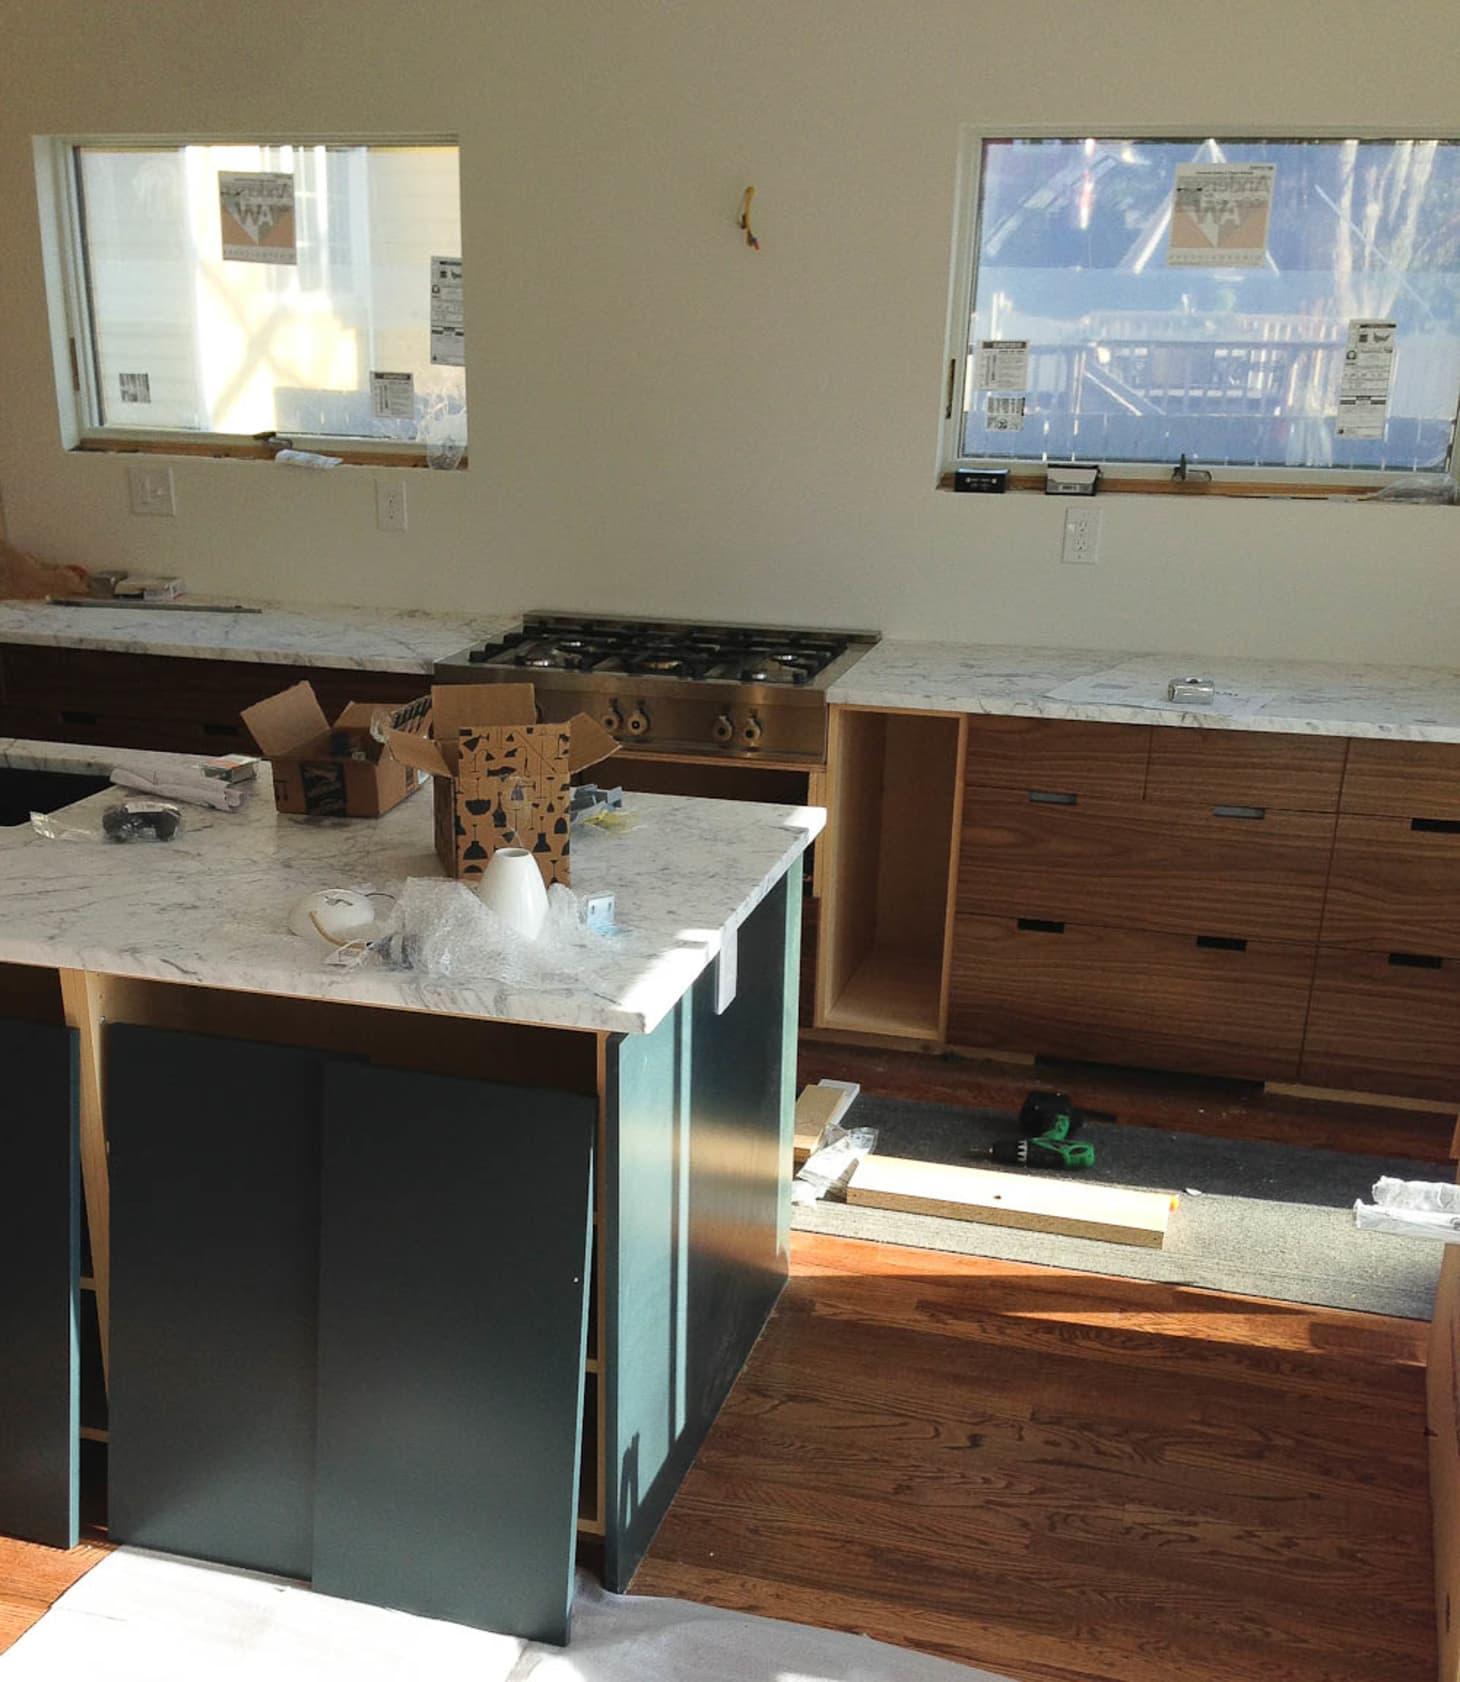 Merveilleux Faithu0027s Kitchen Renovation: How We Finally Got Our Carrara Marble  Countertops